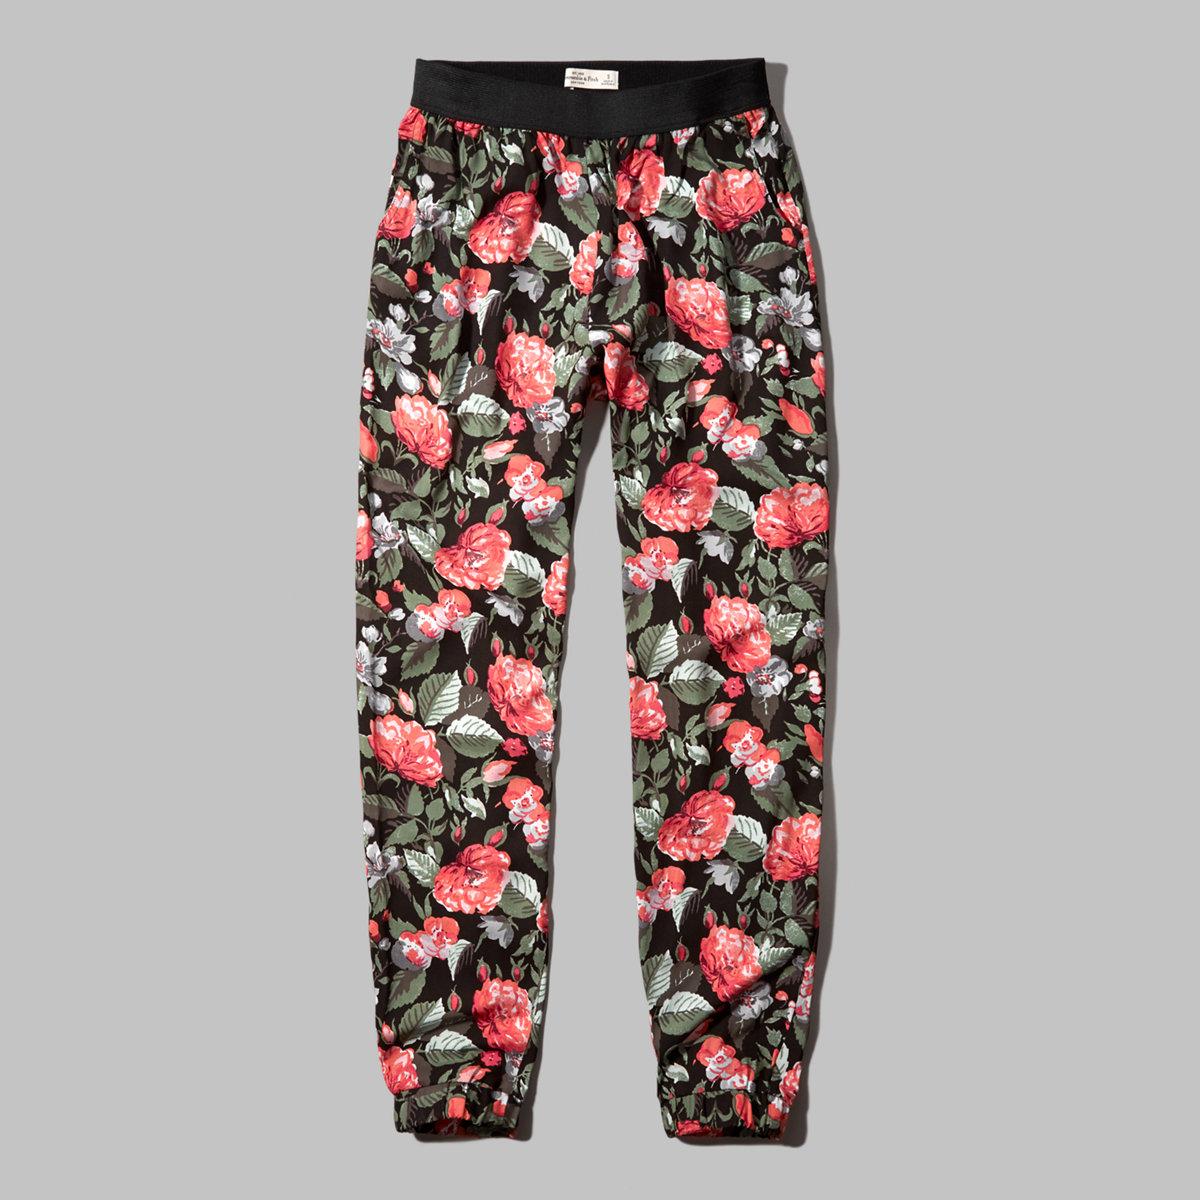 Patterned Drapey Pants